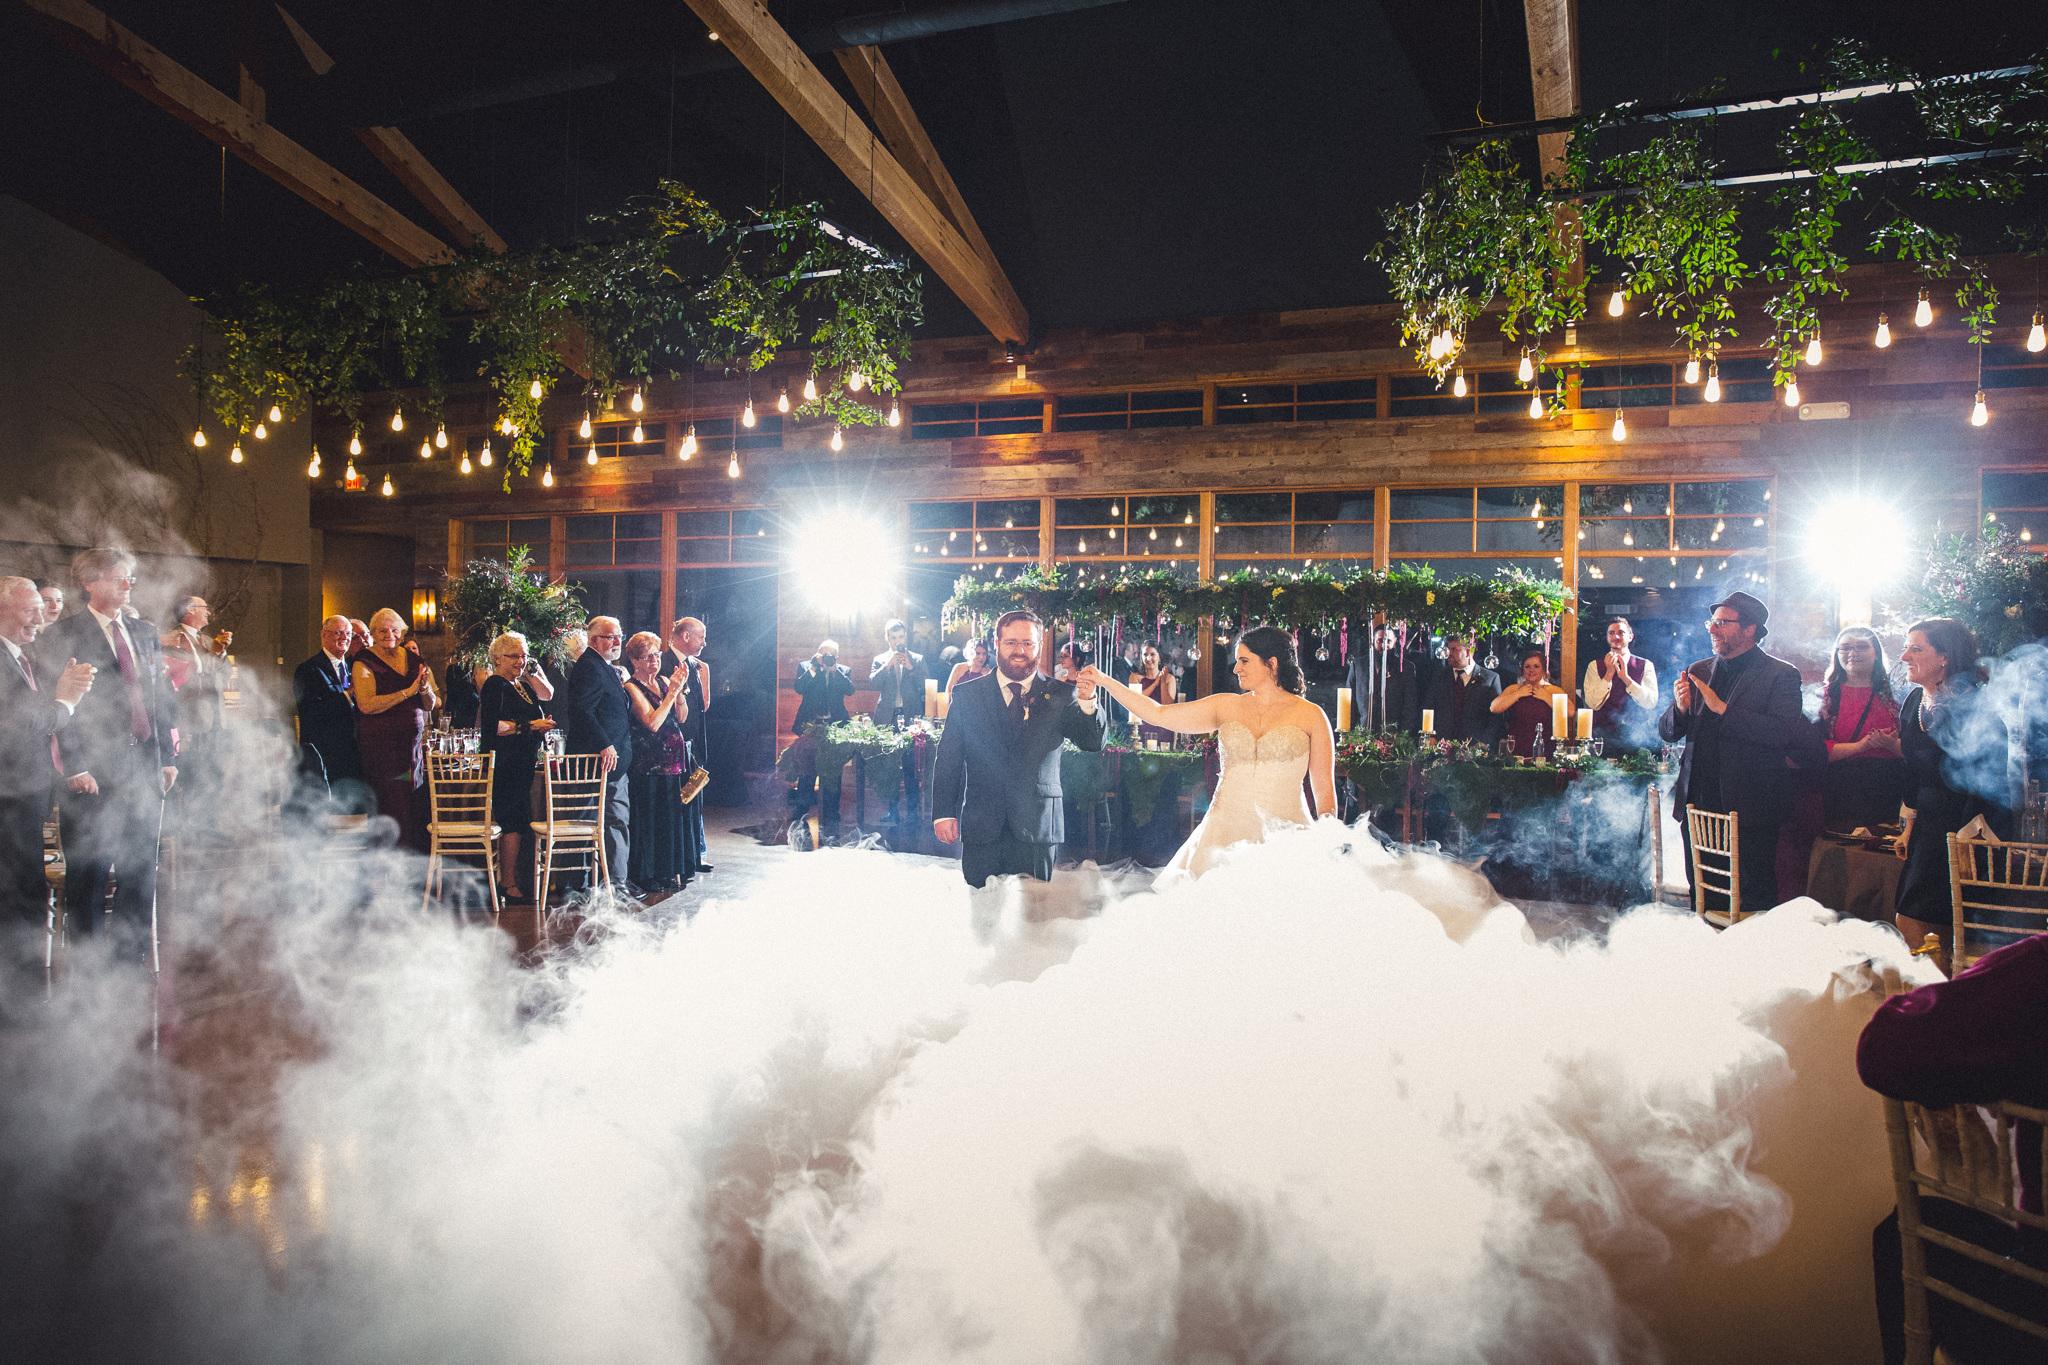 Erin-Scott-wedding-happydaymedia-548.jpg